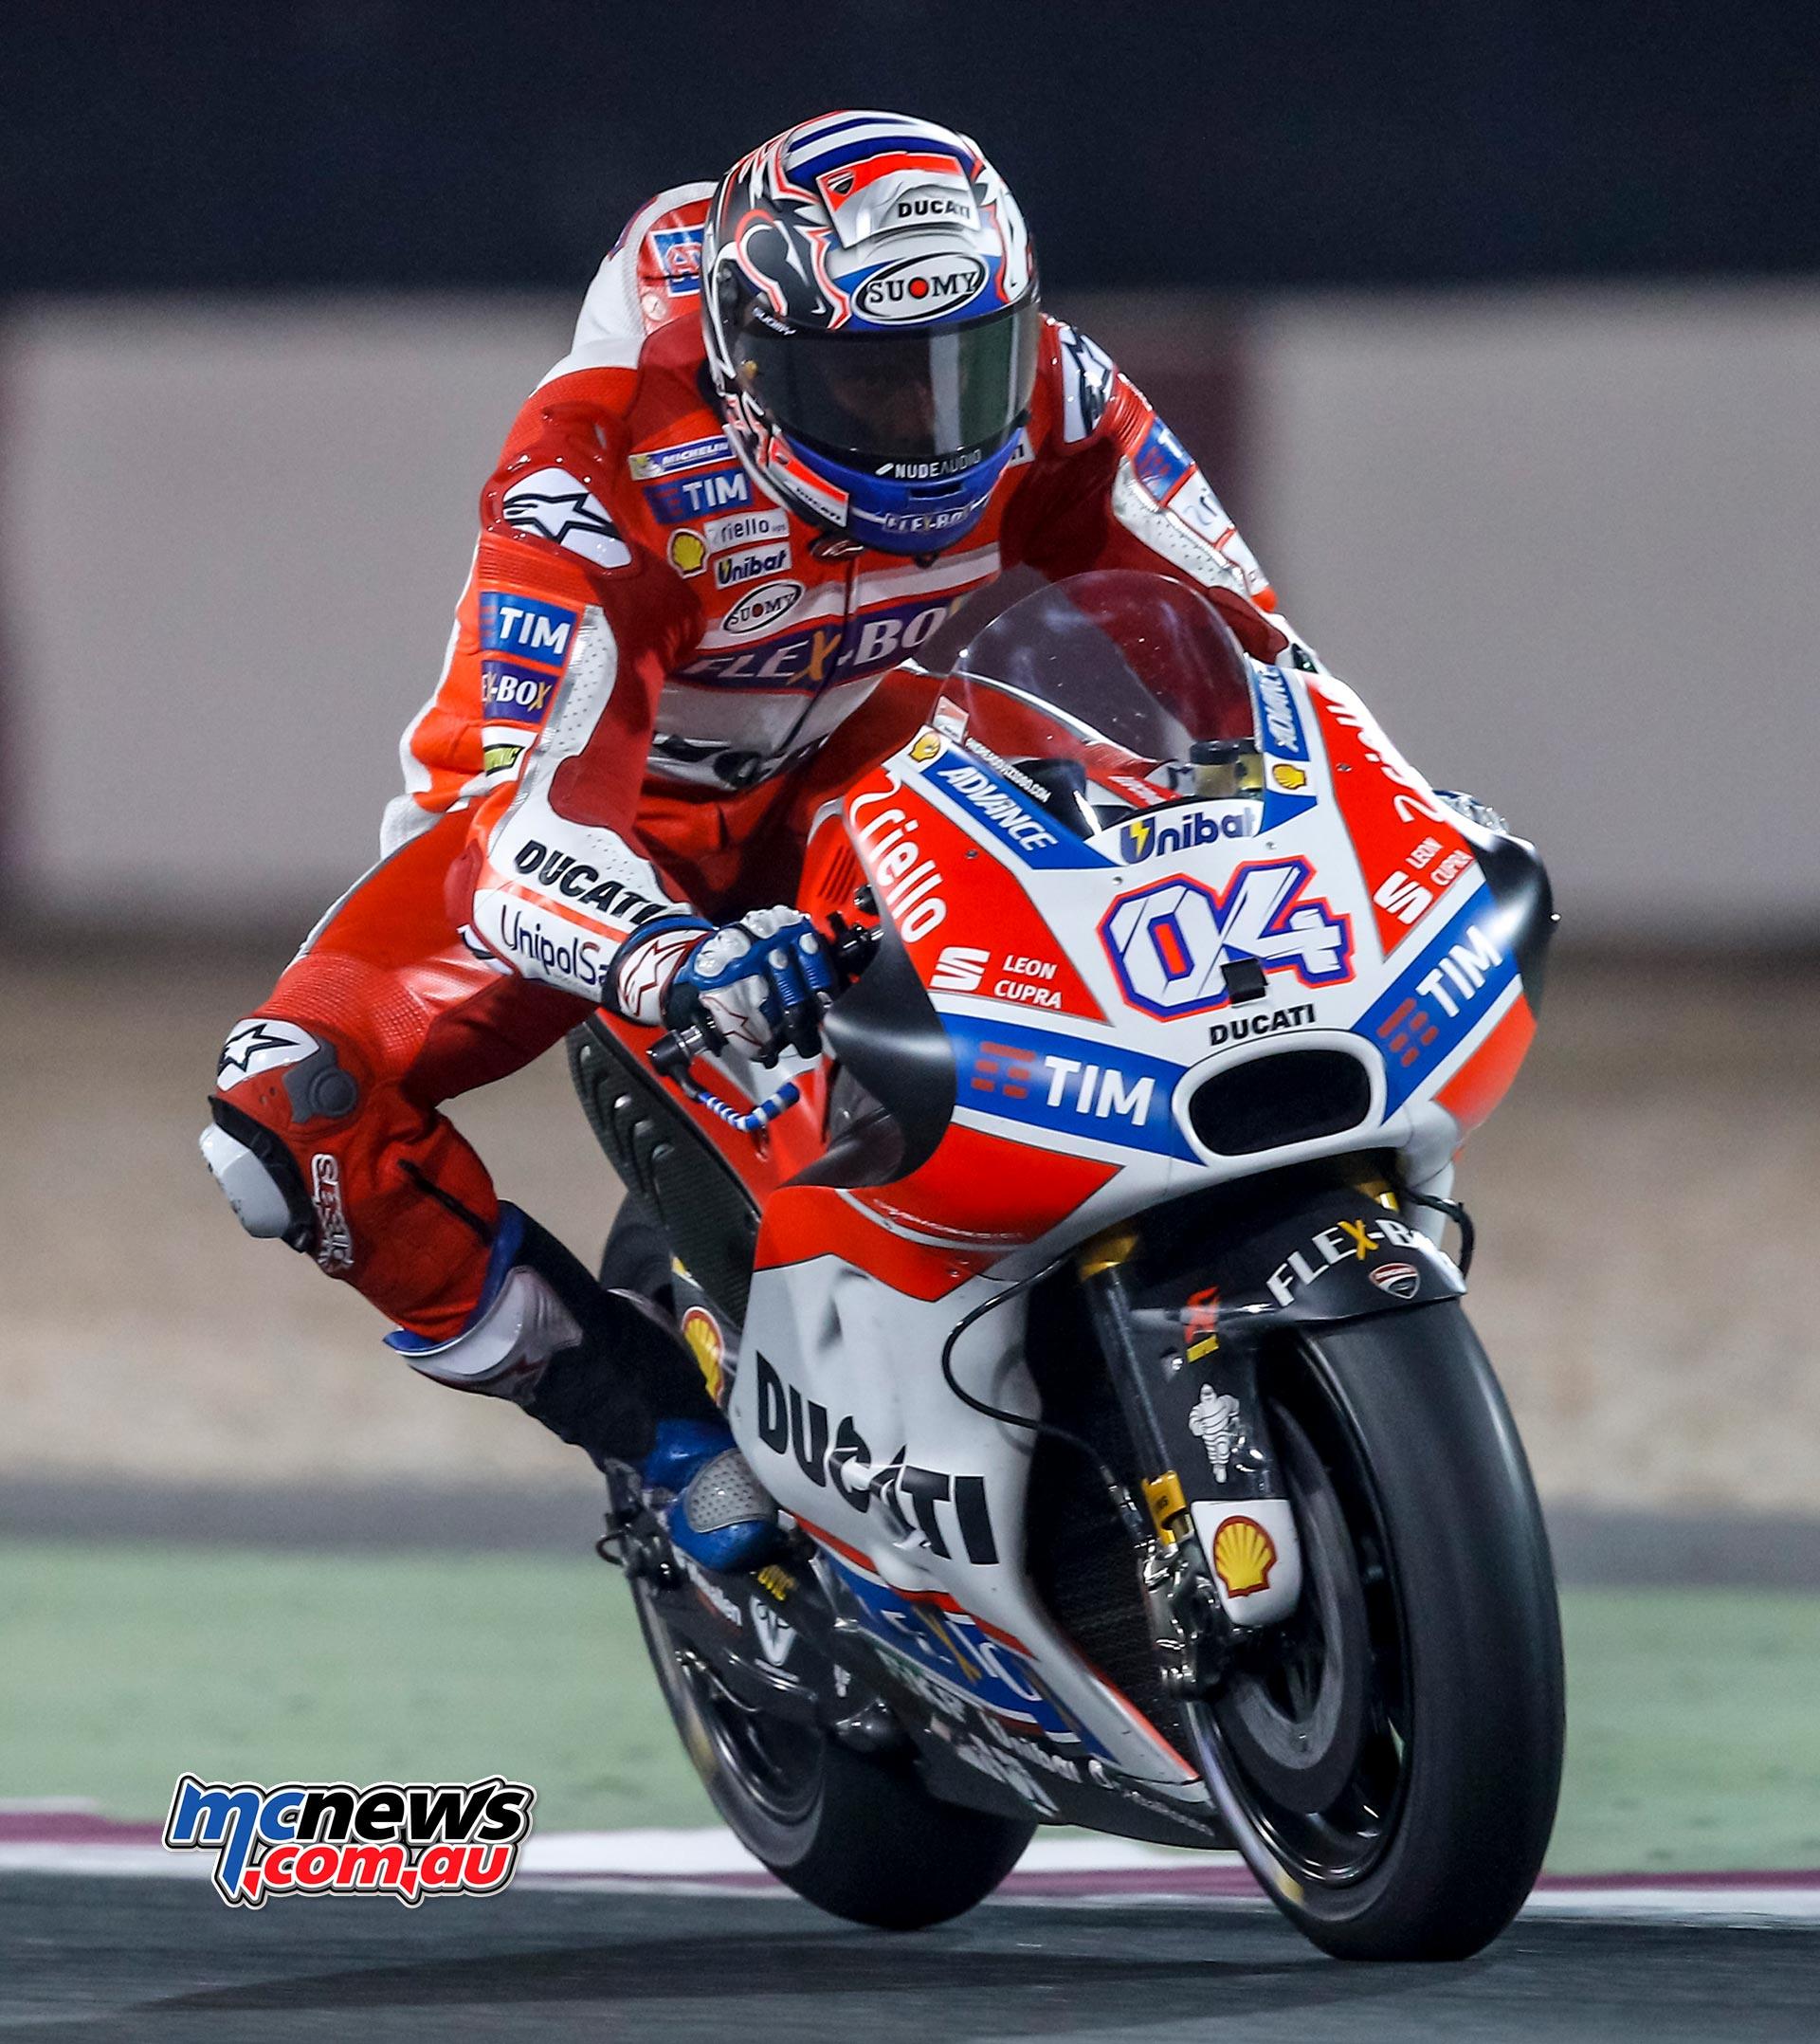 2017 MotoGP season launches in Qatar | MCNews.com.au